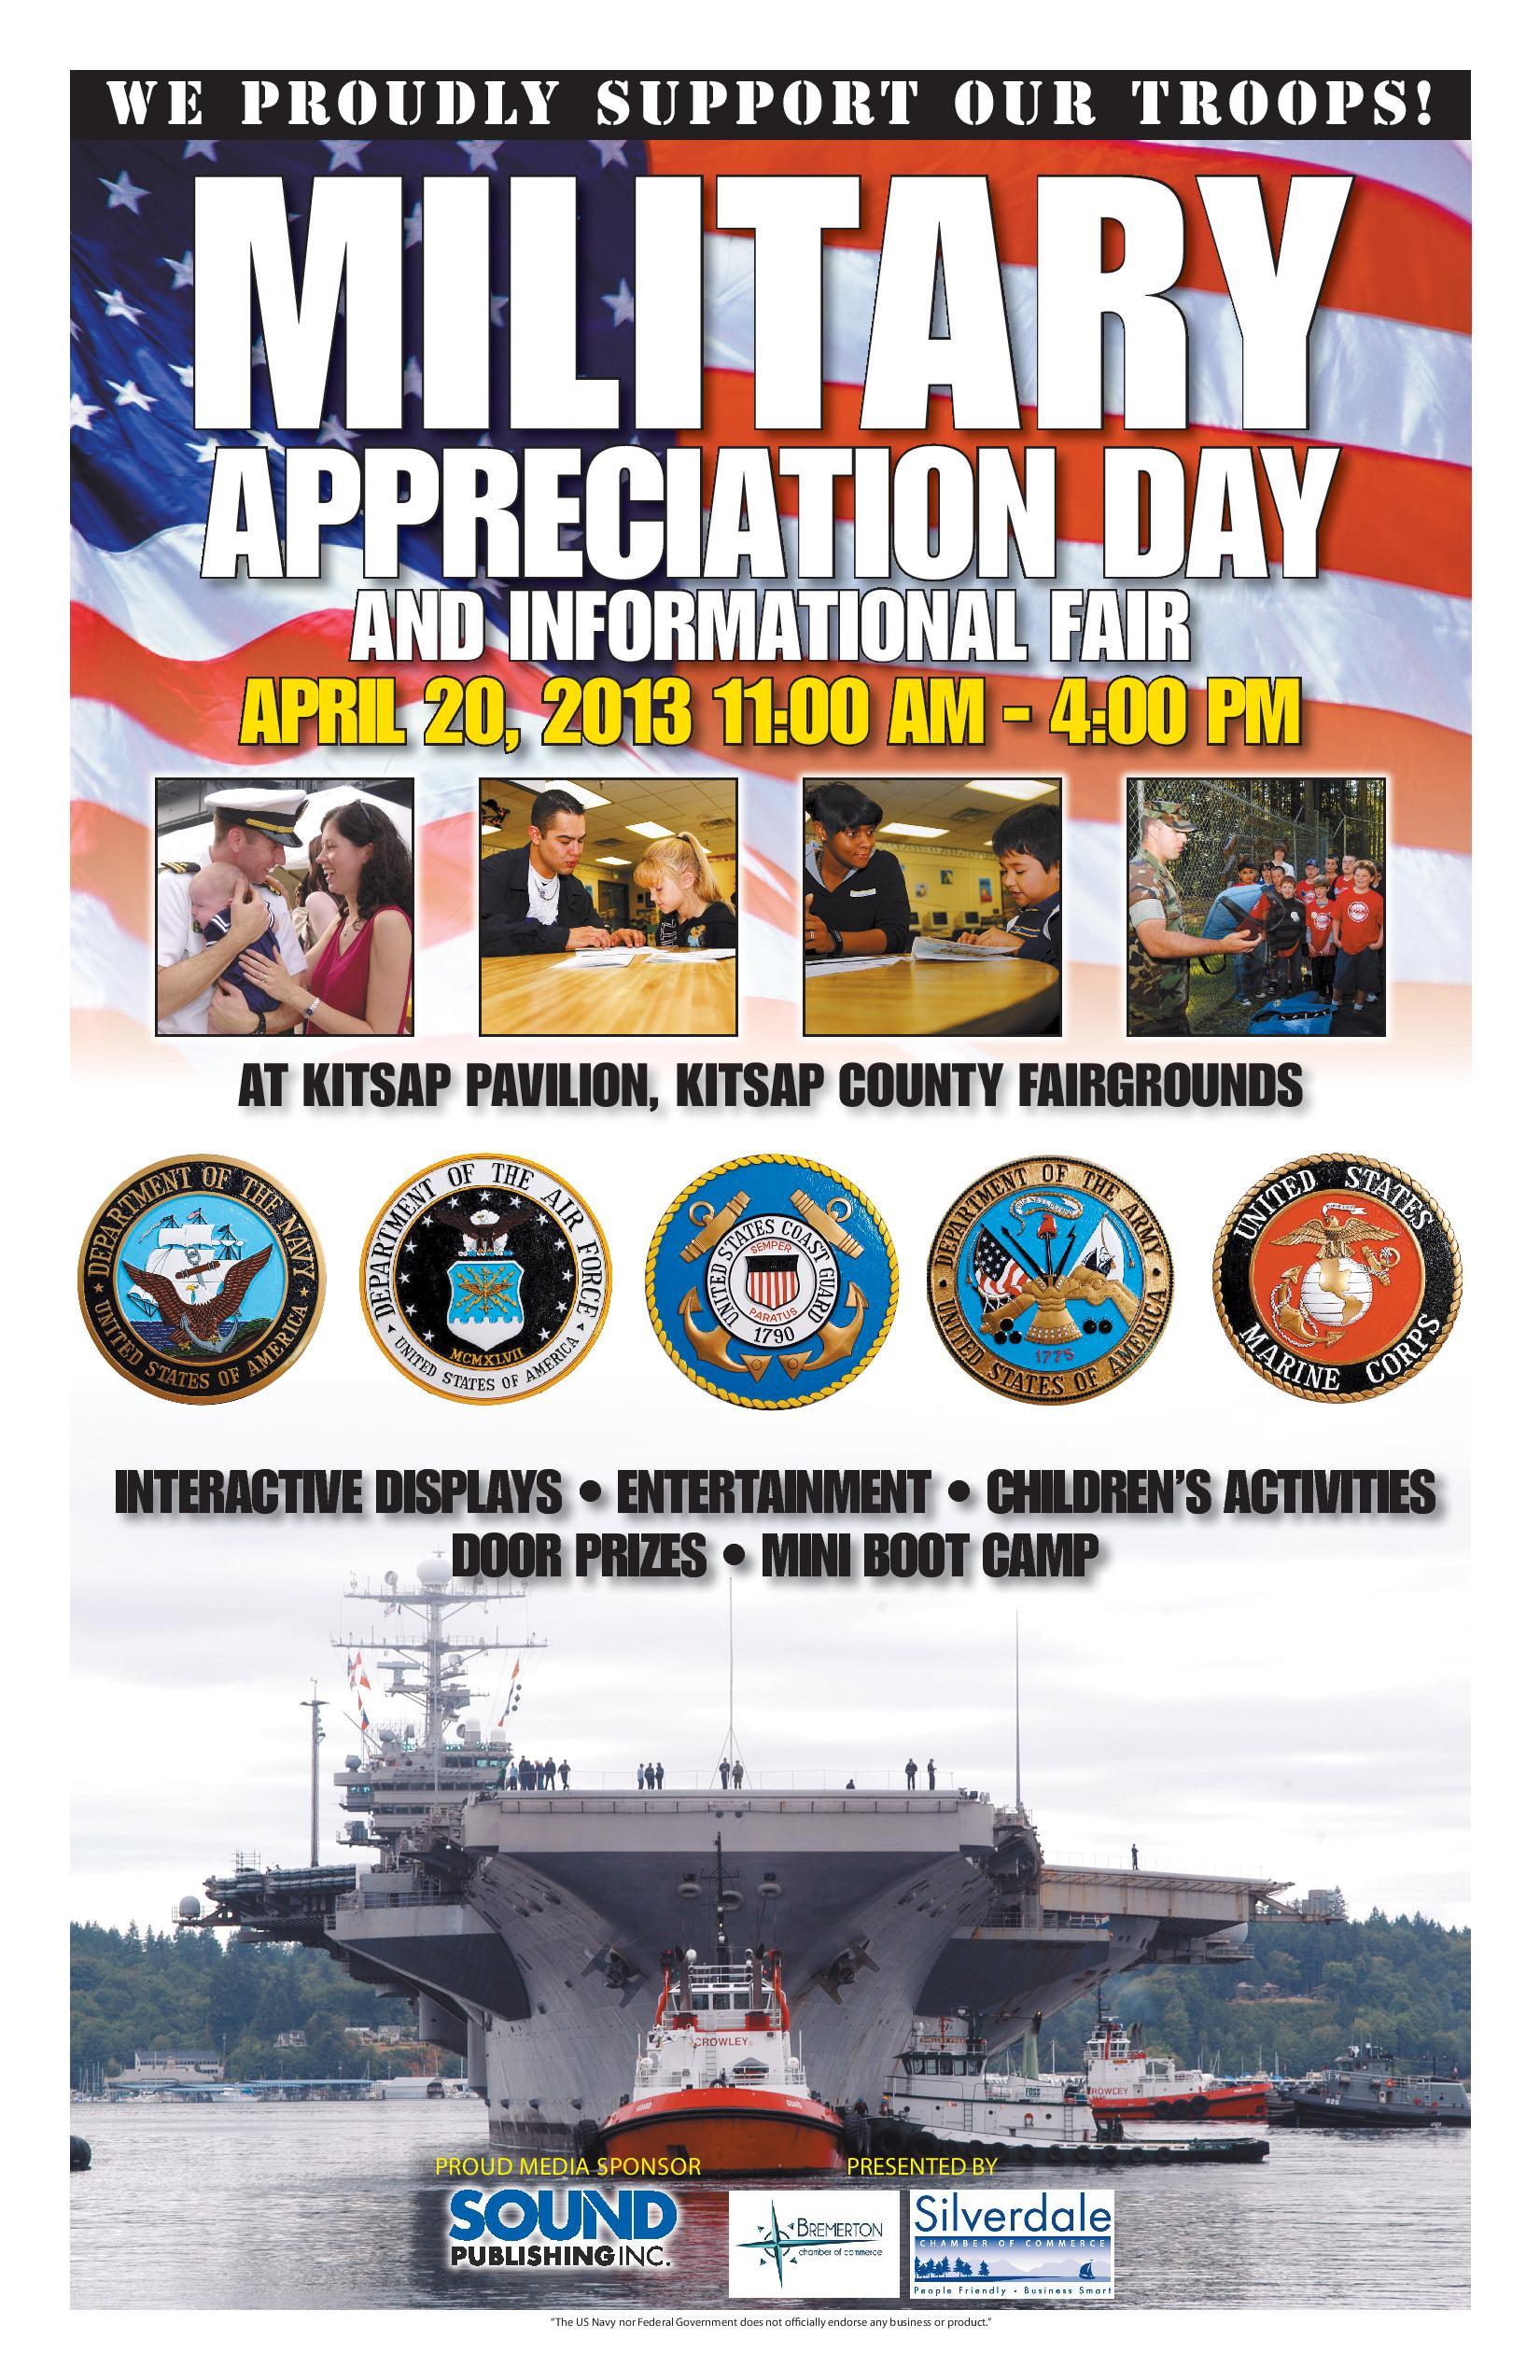 Apr 20 Military Appreciation Day Kitsap Fairgrounds